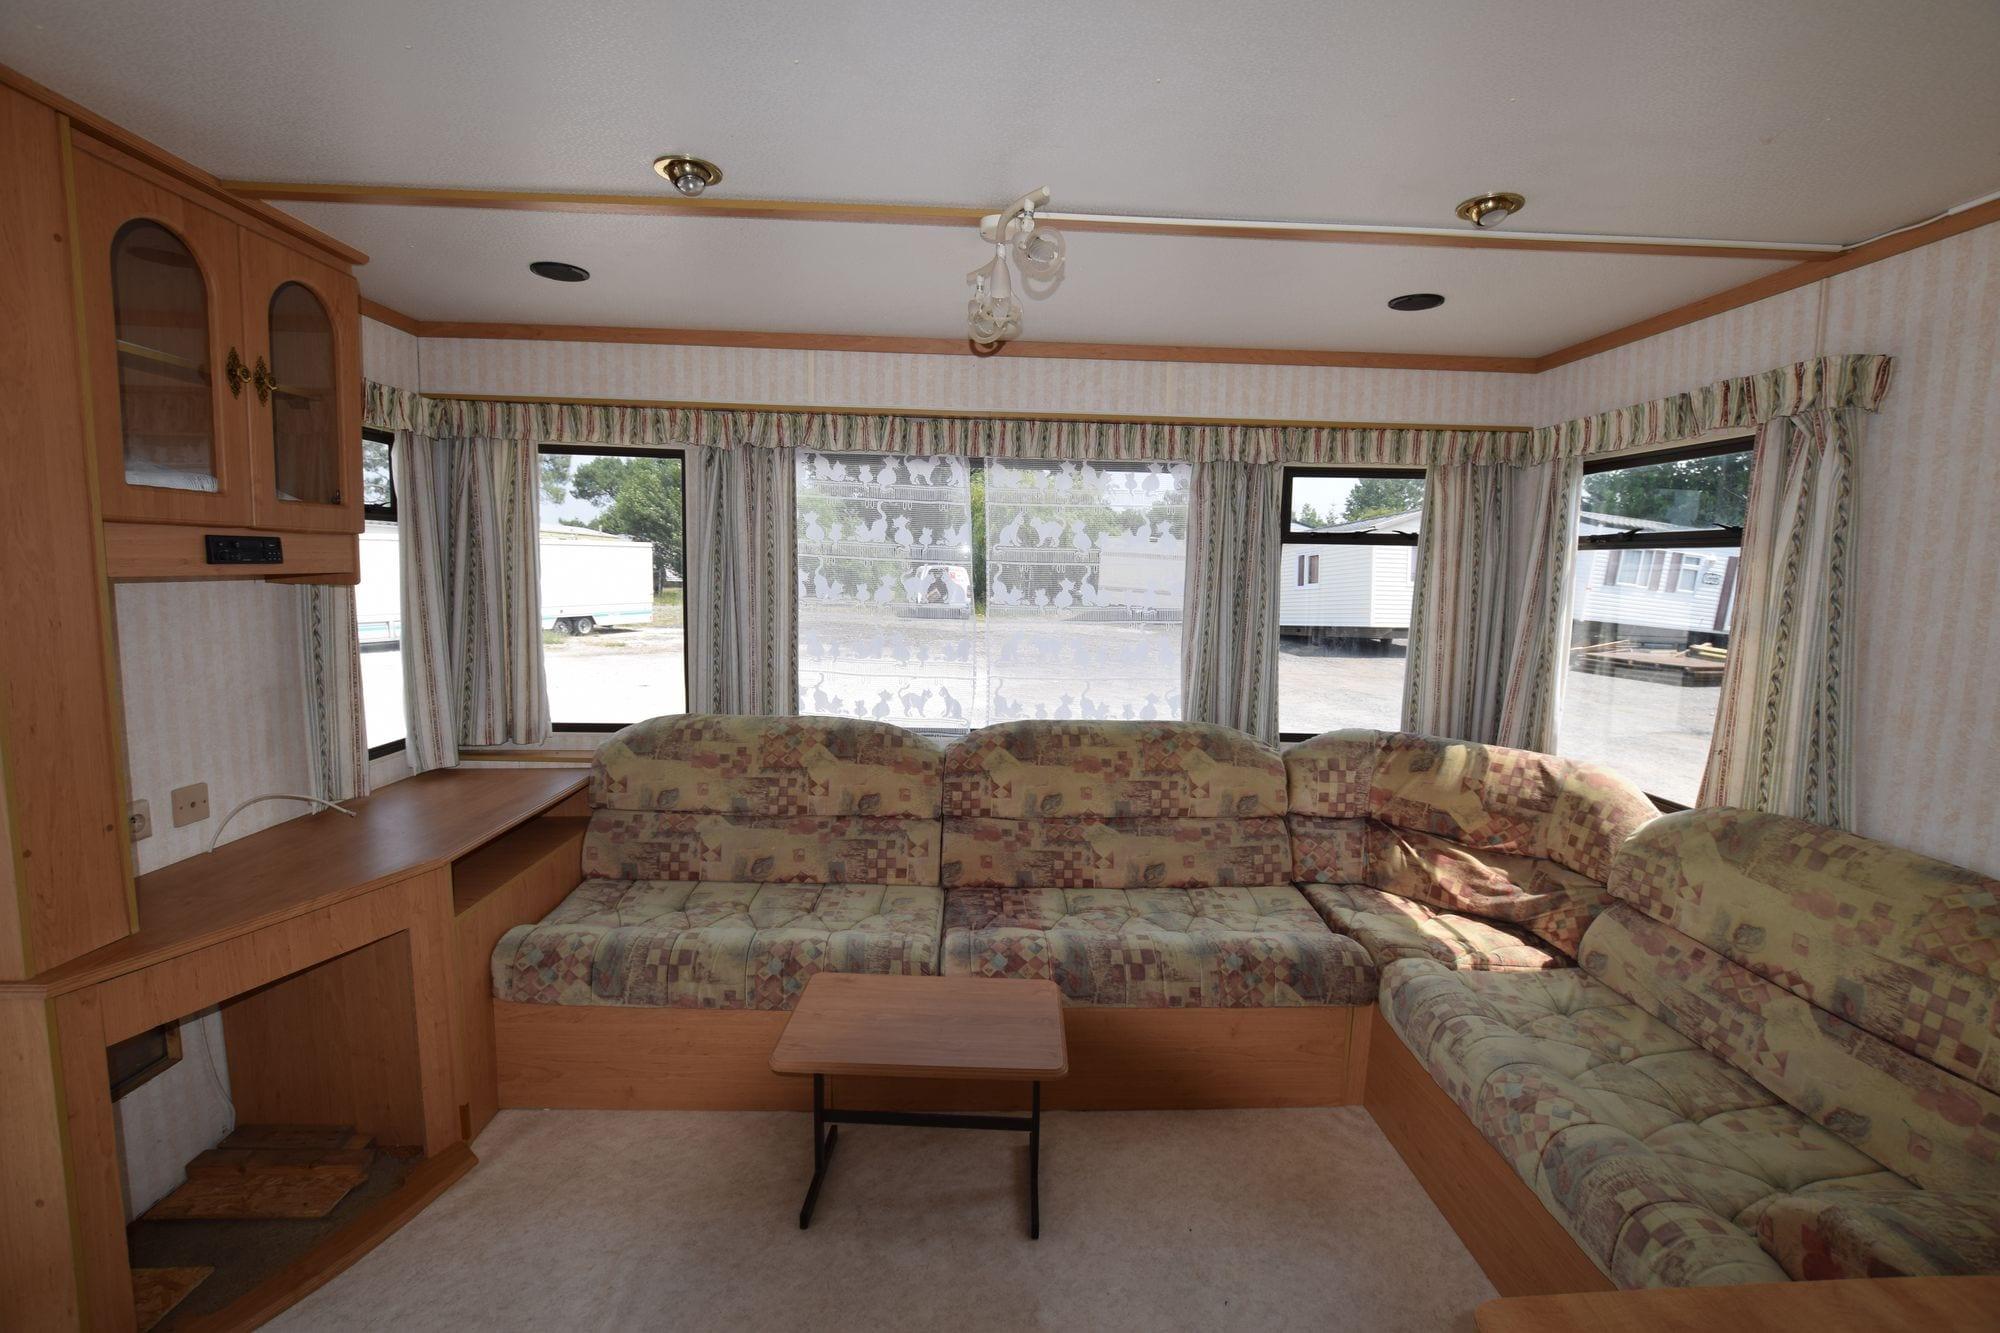 Cosalt excellence mobil home d 39 occasion 5 000 zen for Salon mobil home